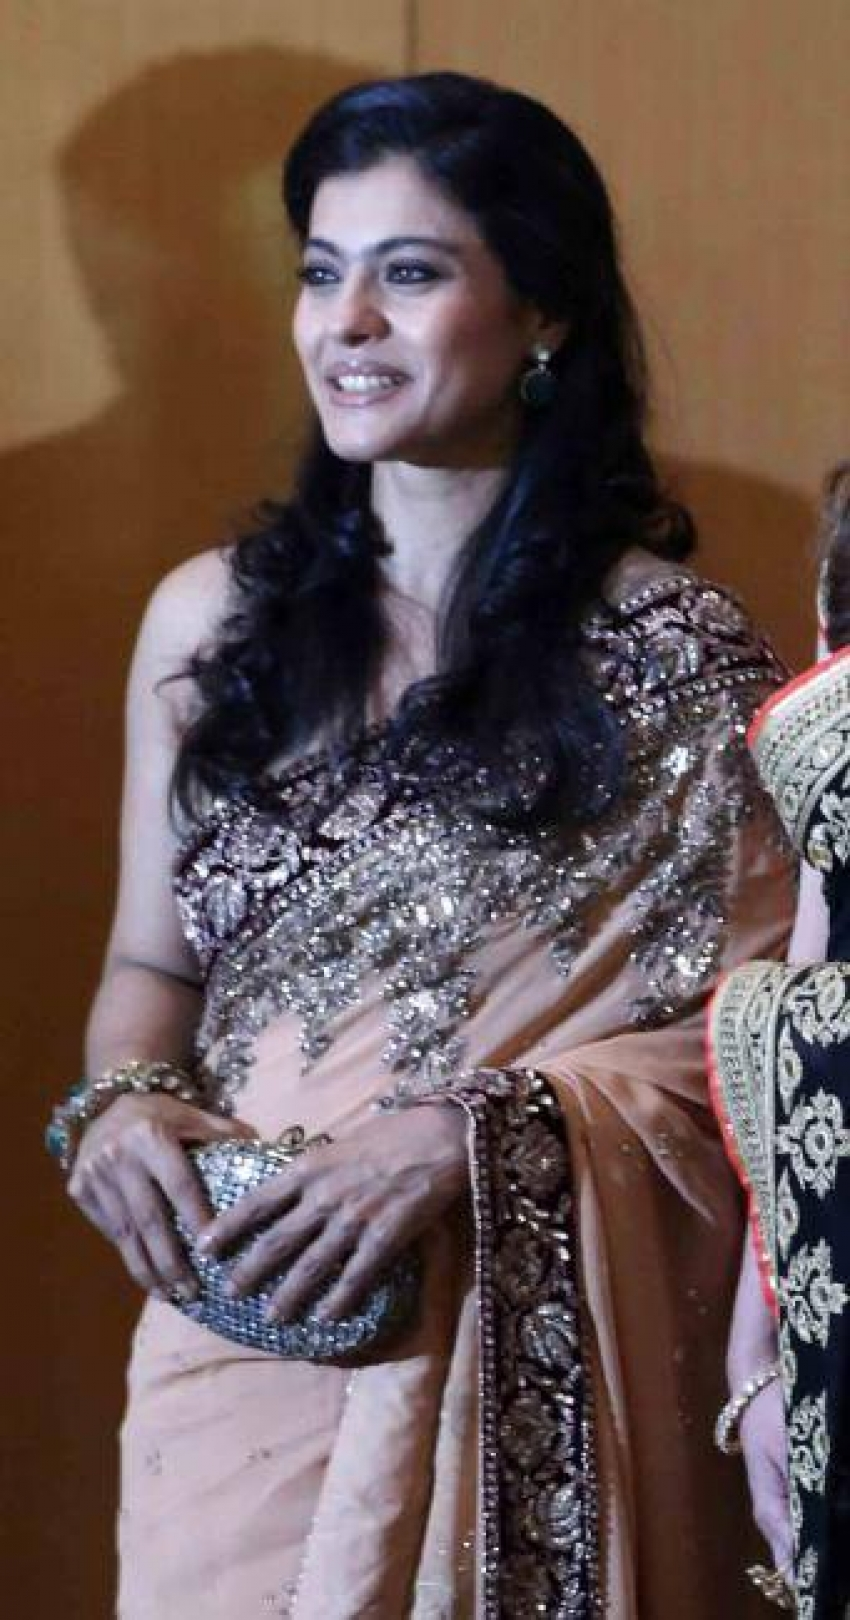 Kajol and Ajay Devgan with Prince Charles and Camilla Photos